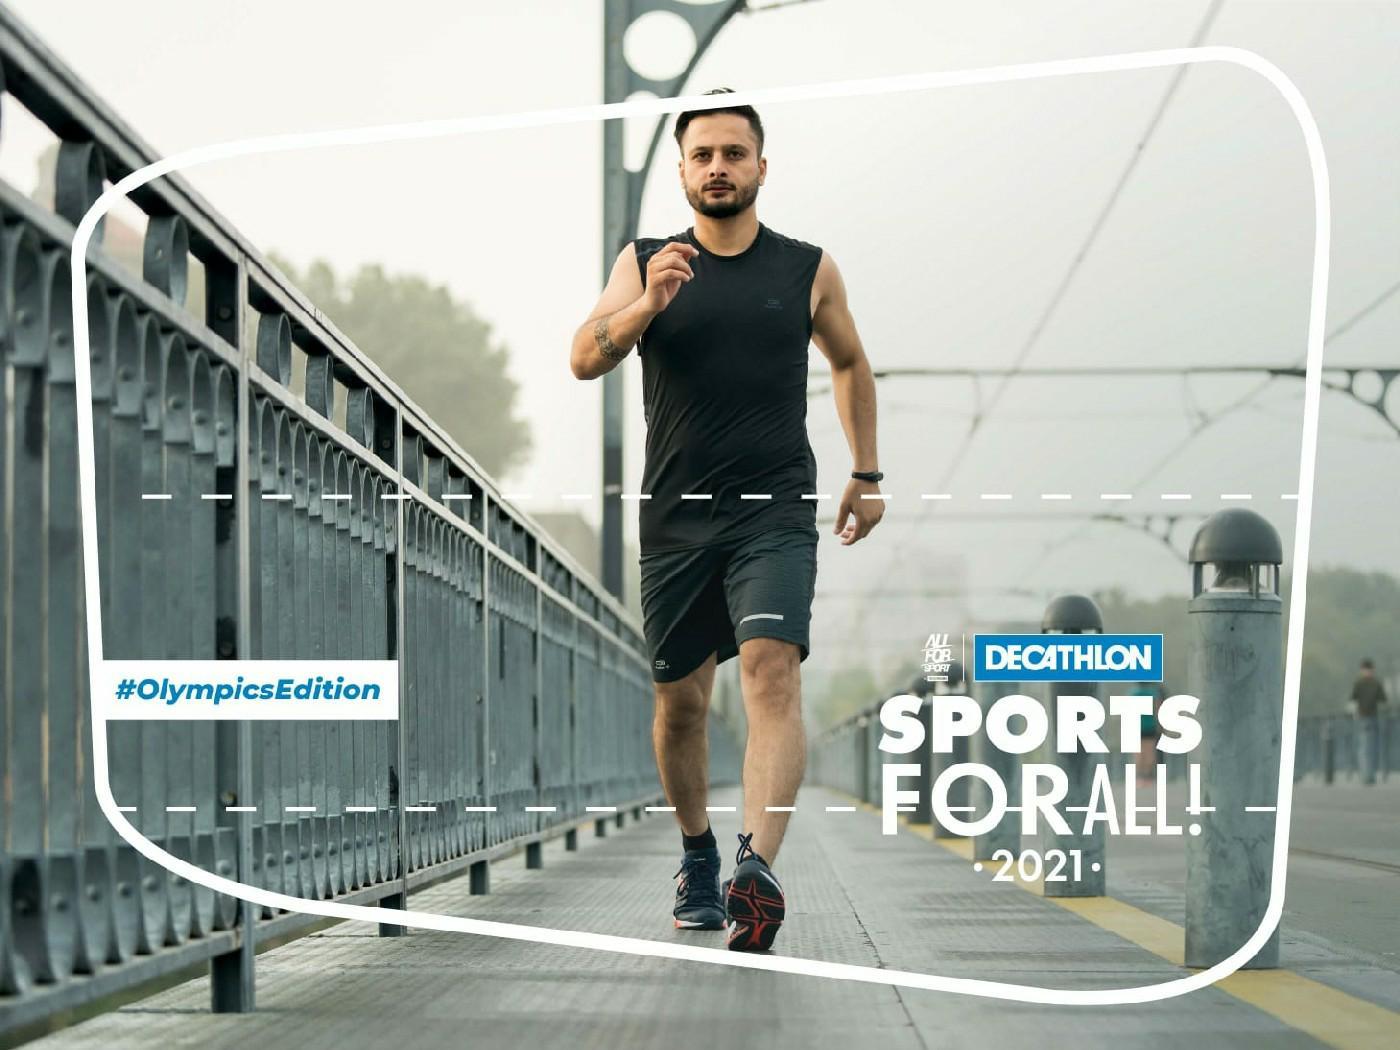 20km Walking Challenge